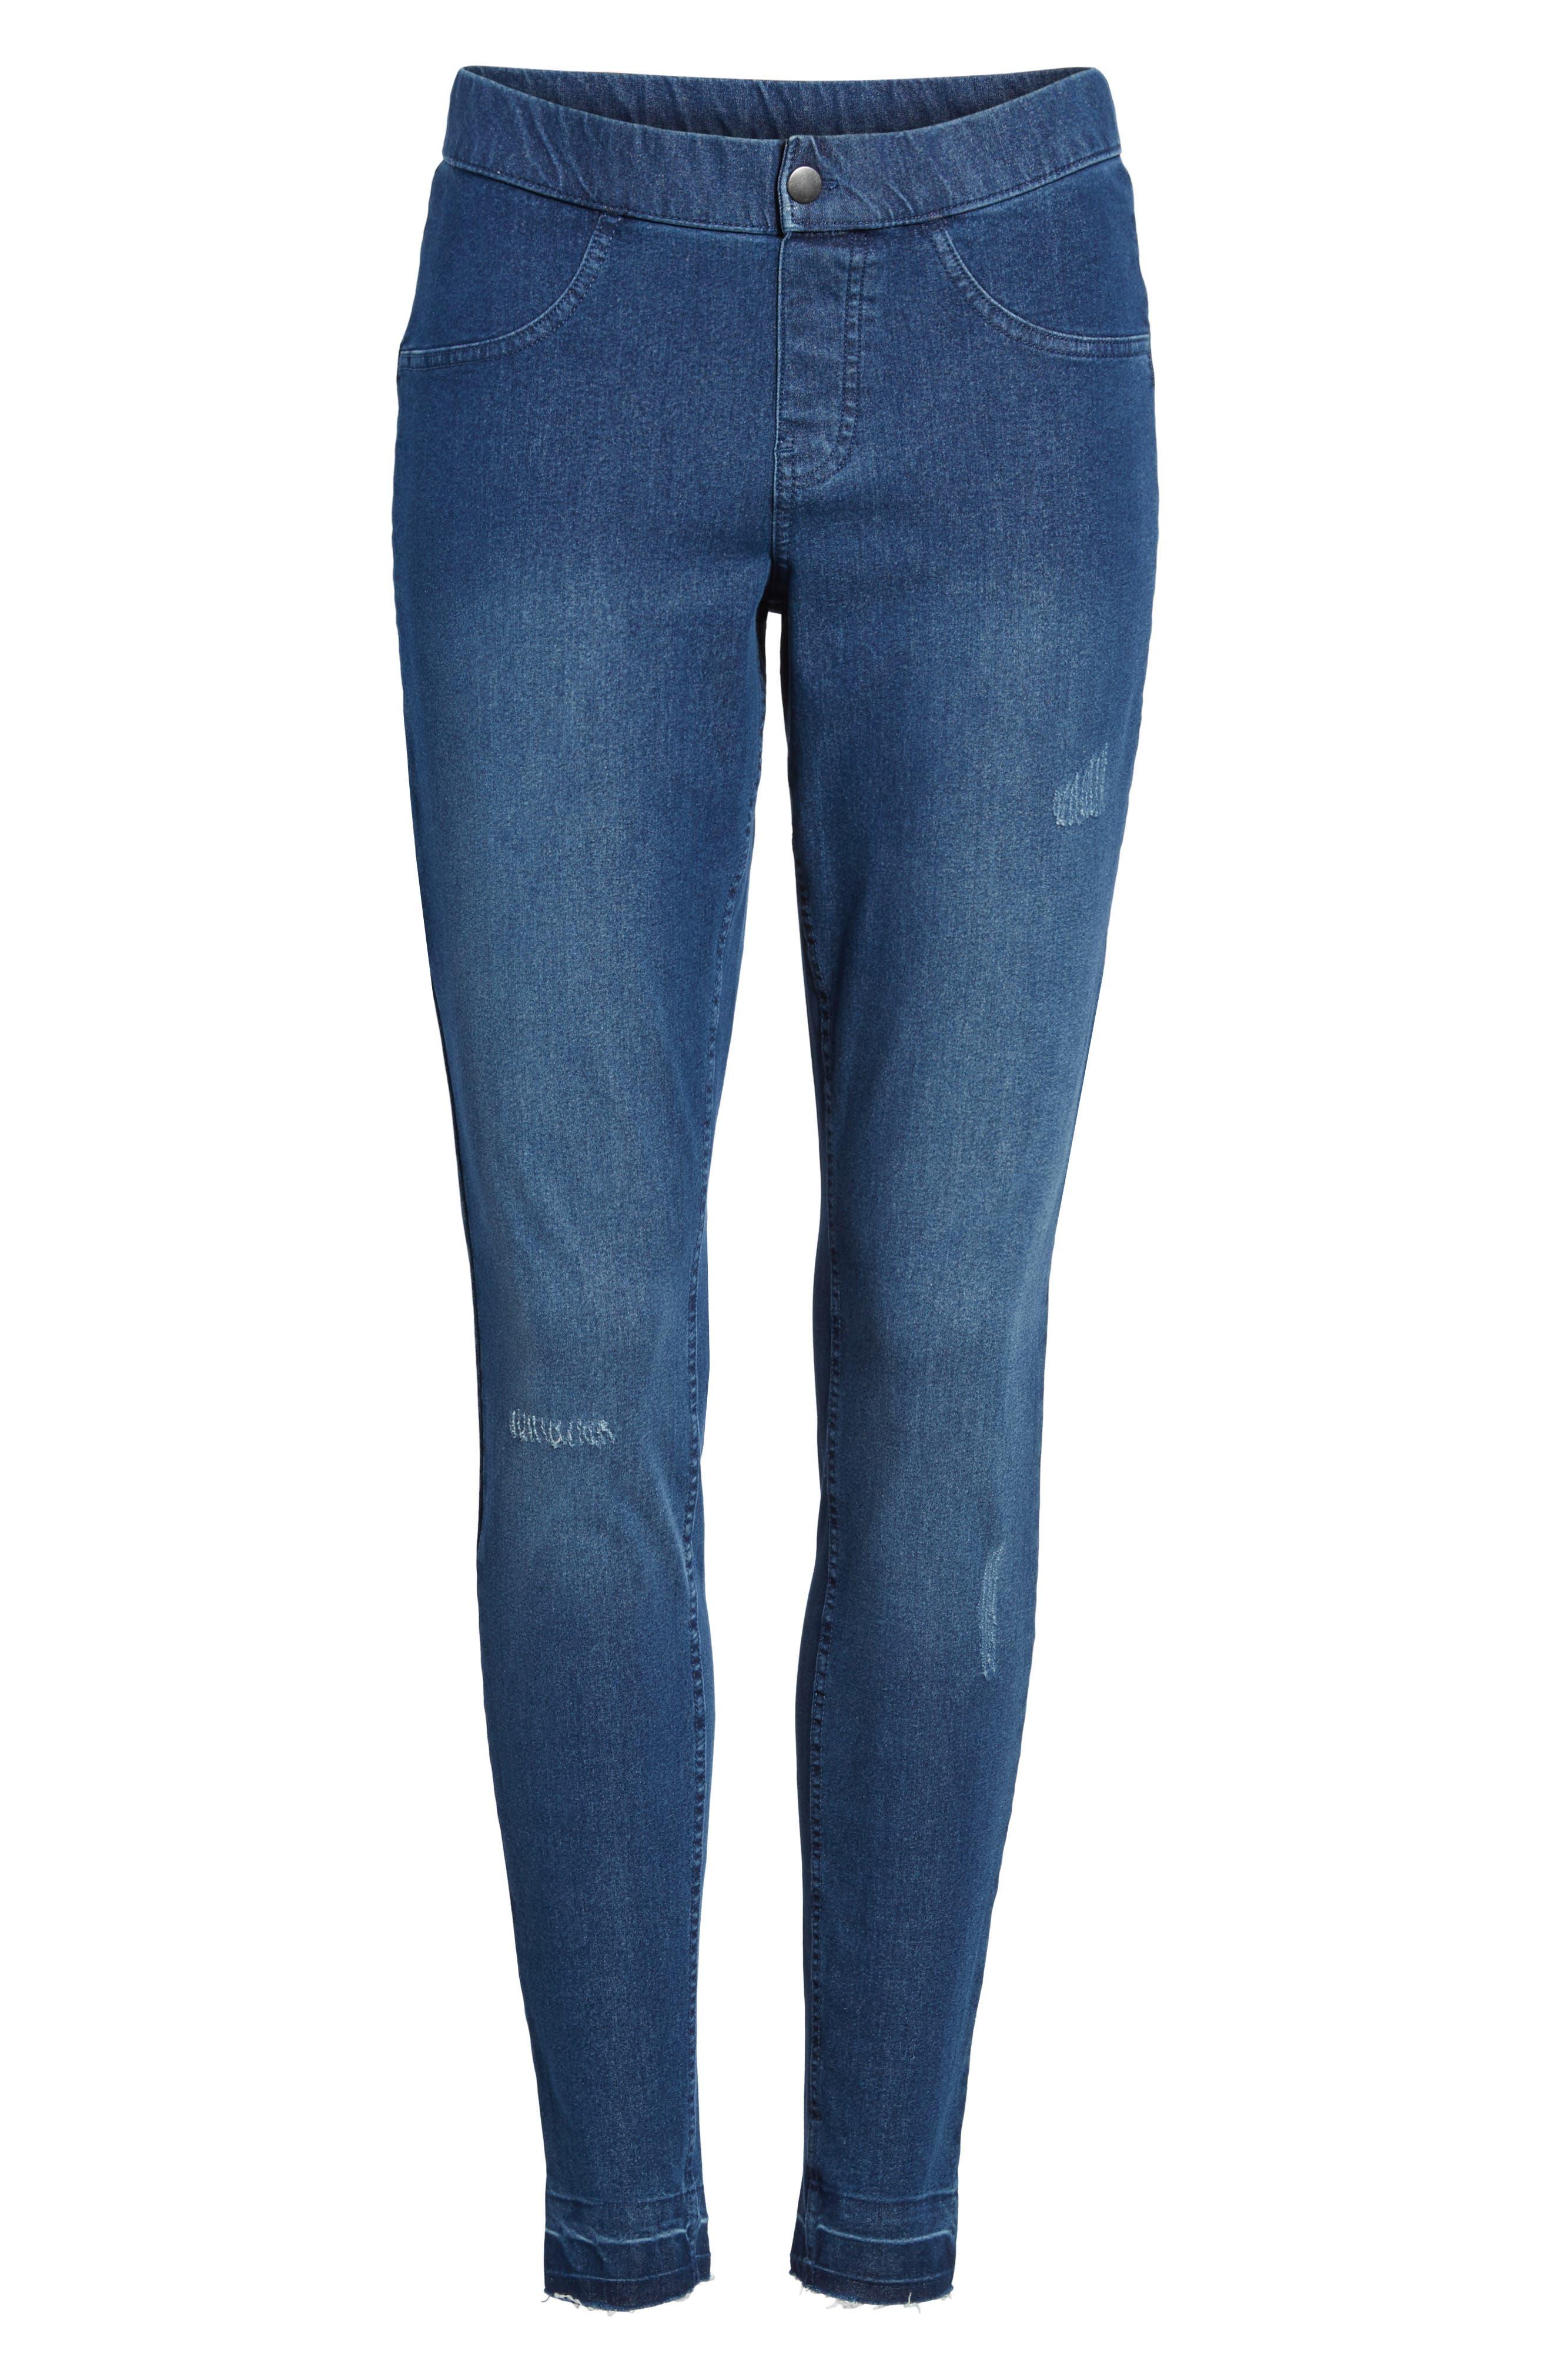 Selvedge Edge Denim Leggings,                         Main,                         color, Medium Wash